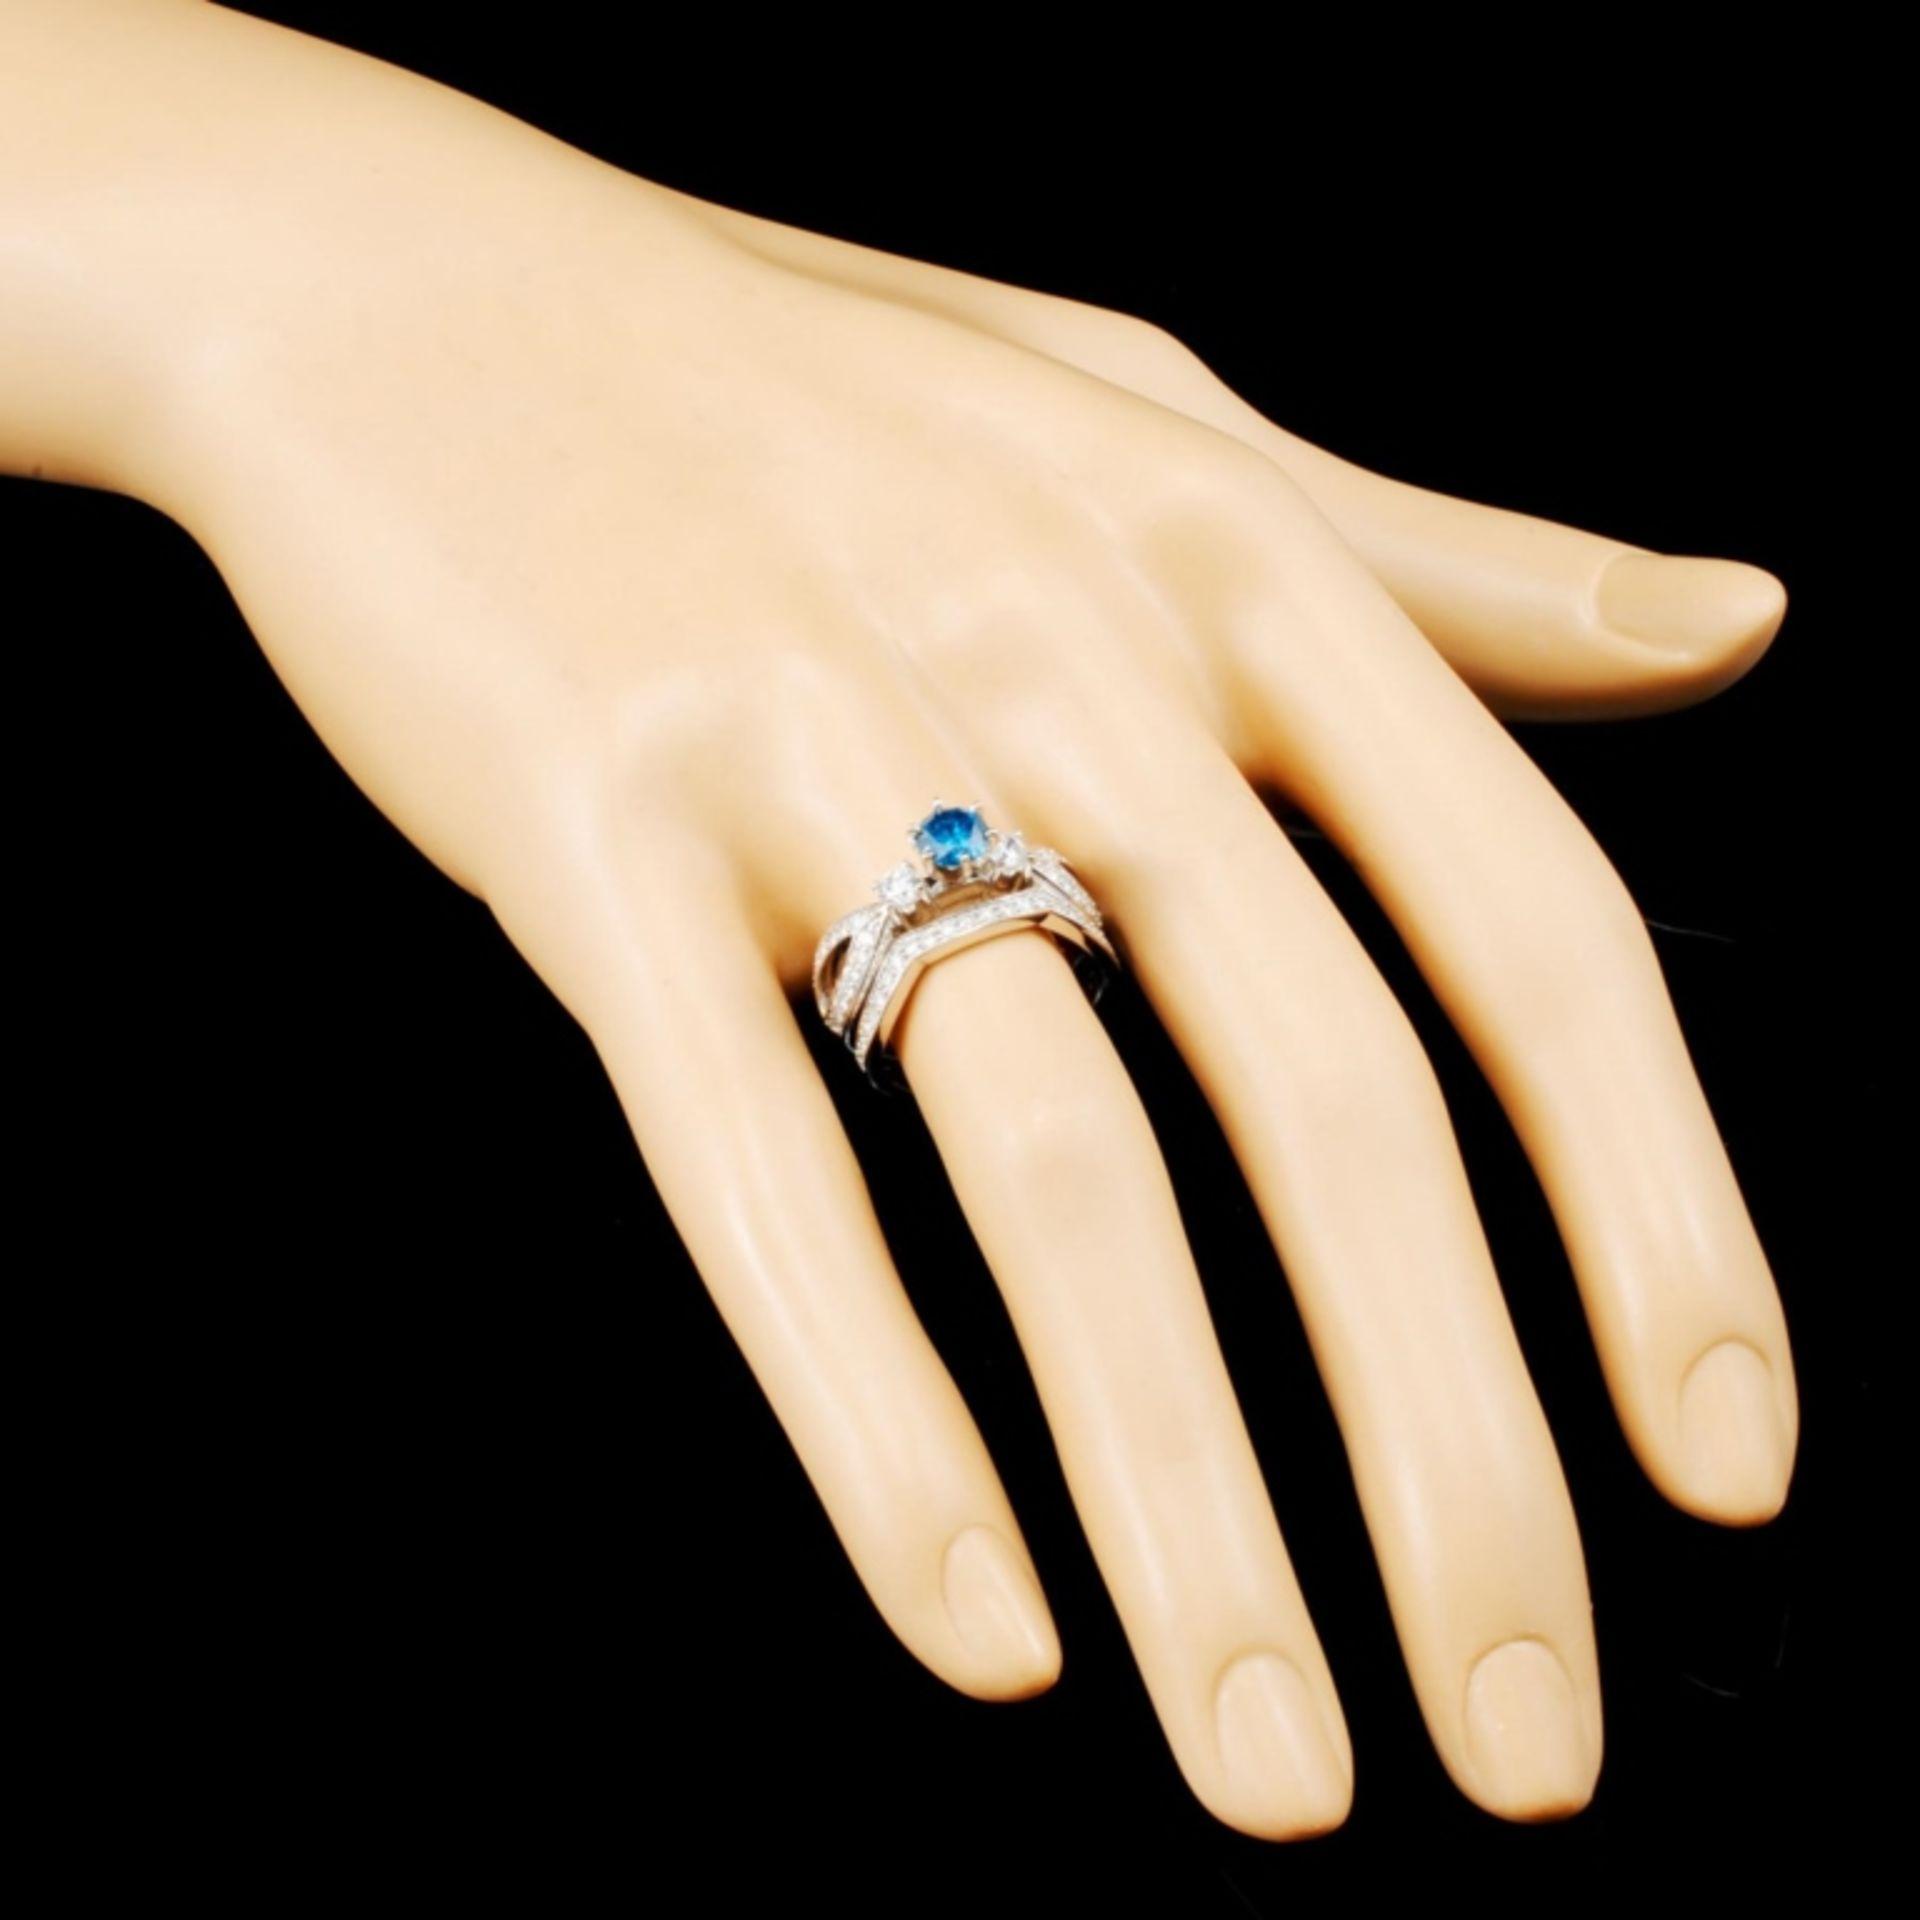 18K Gold 1.35ctw Diamond Ring - Image 3 of 5